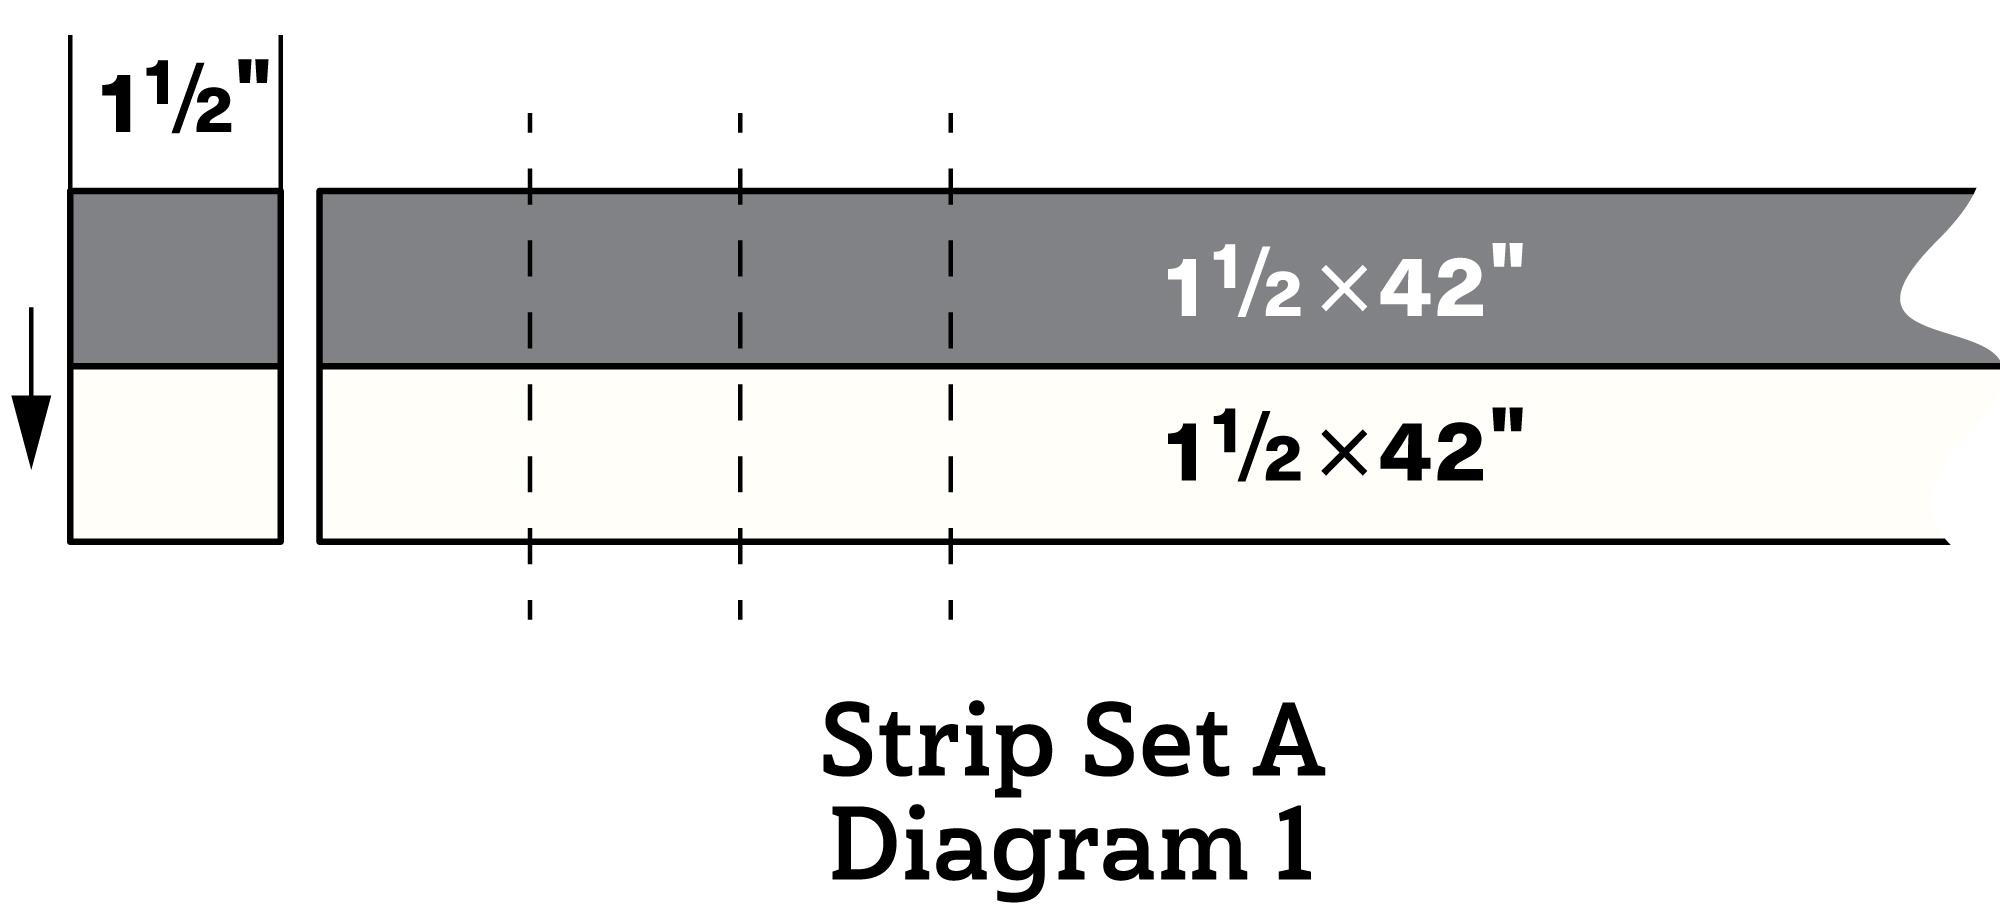 Good Tidings diagram 1